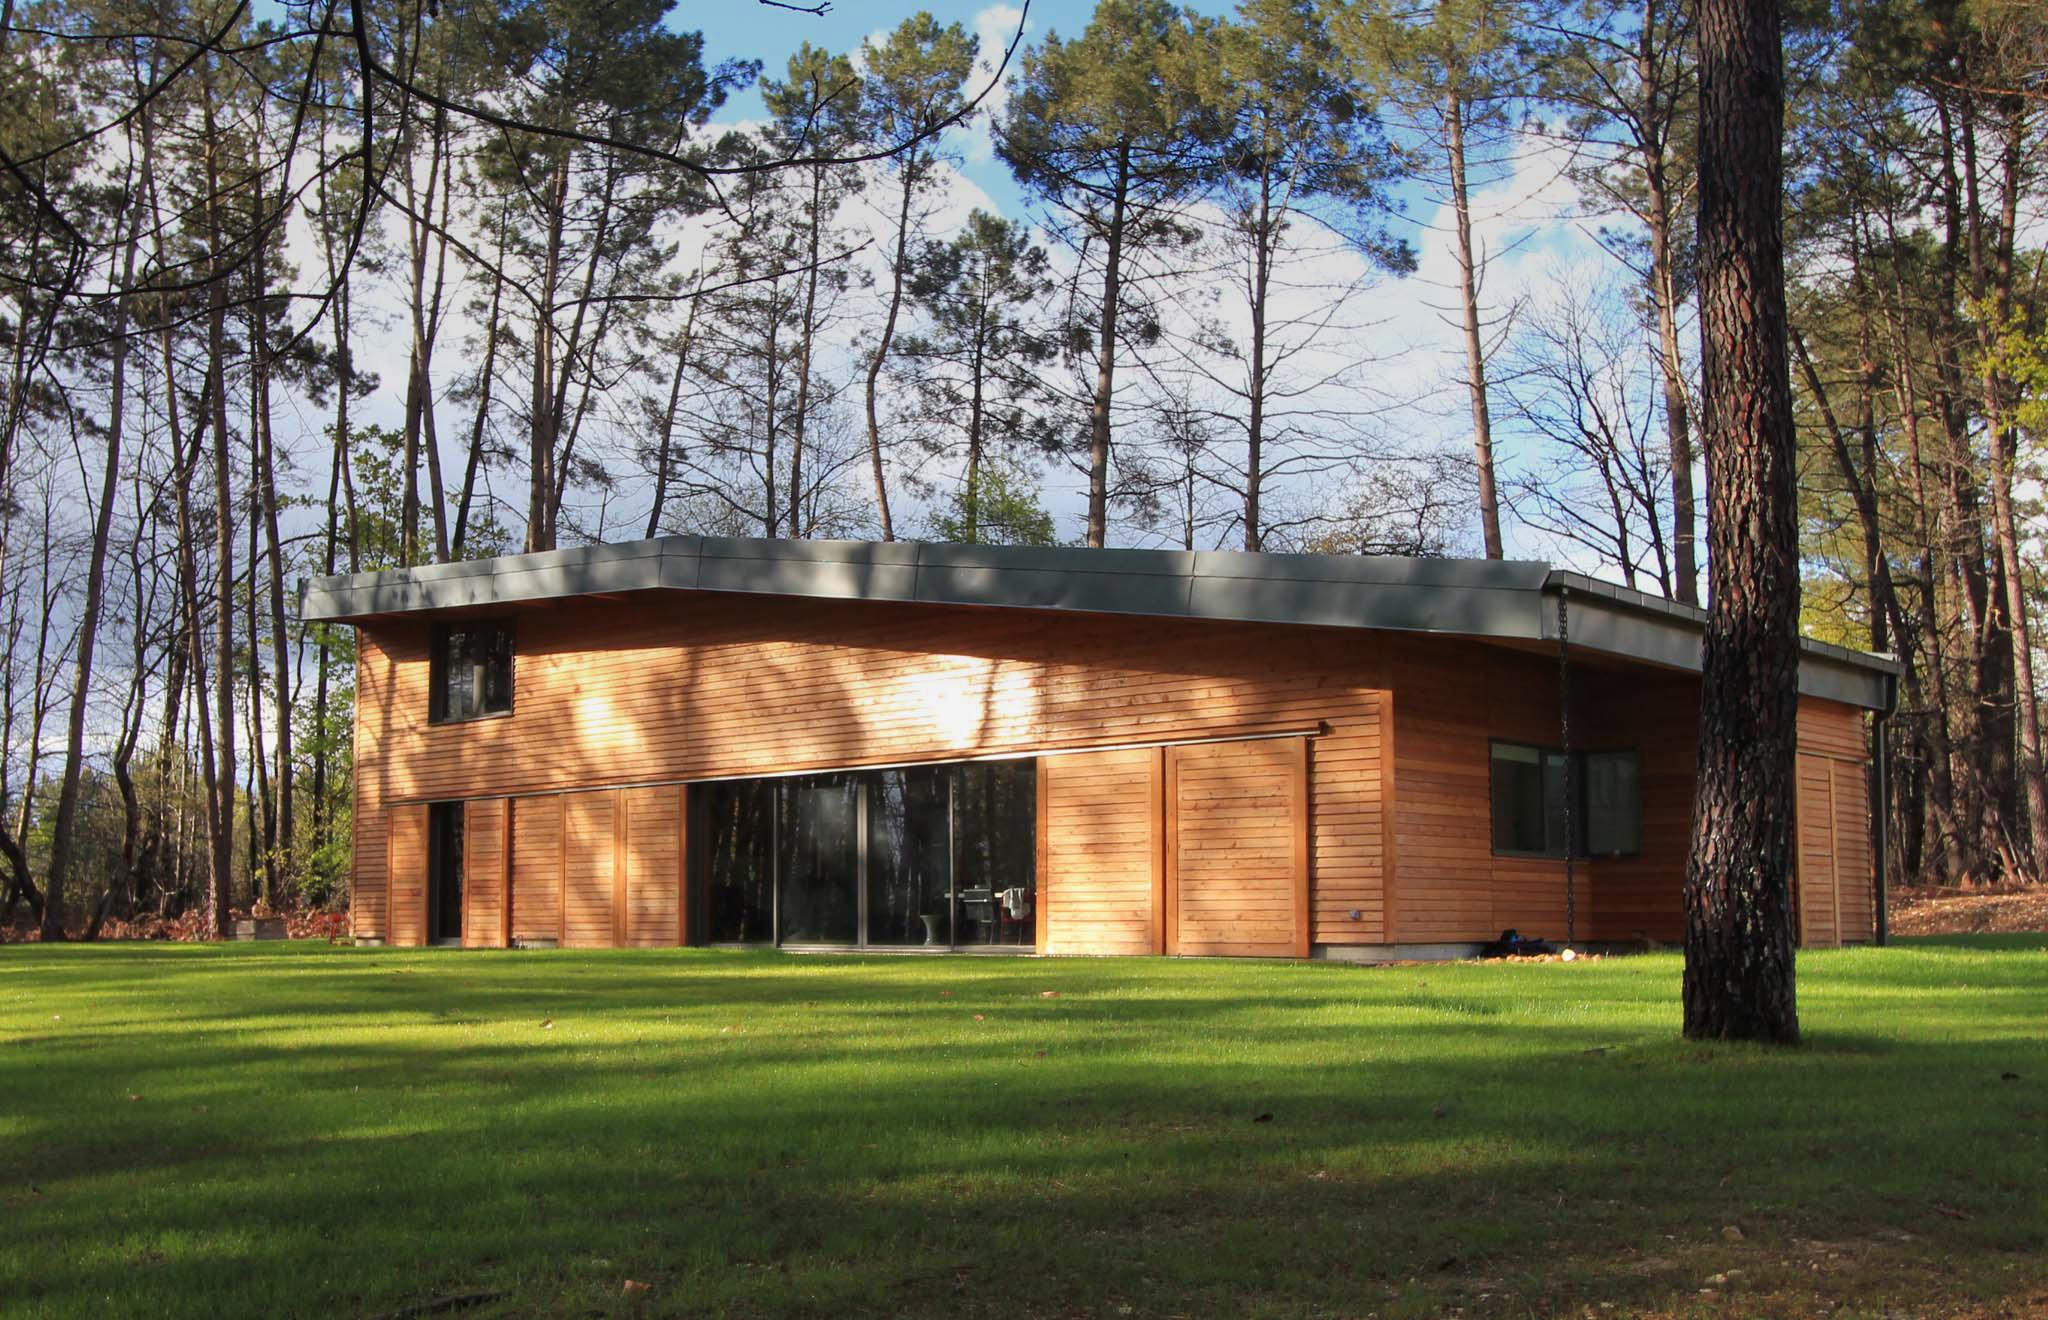 maskarade-architecture-maison-bois-vacances-dordogne-2